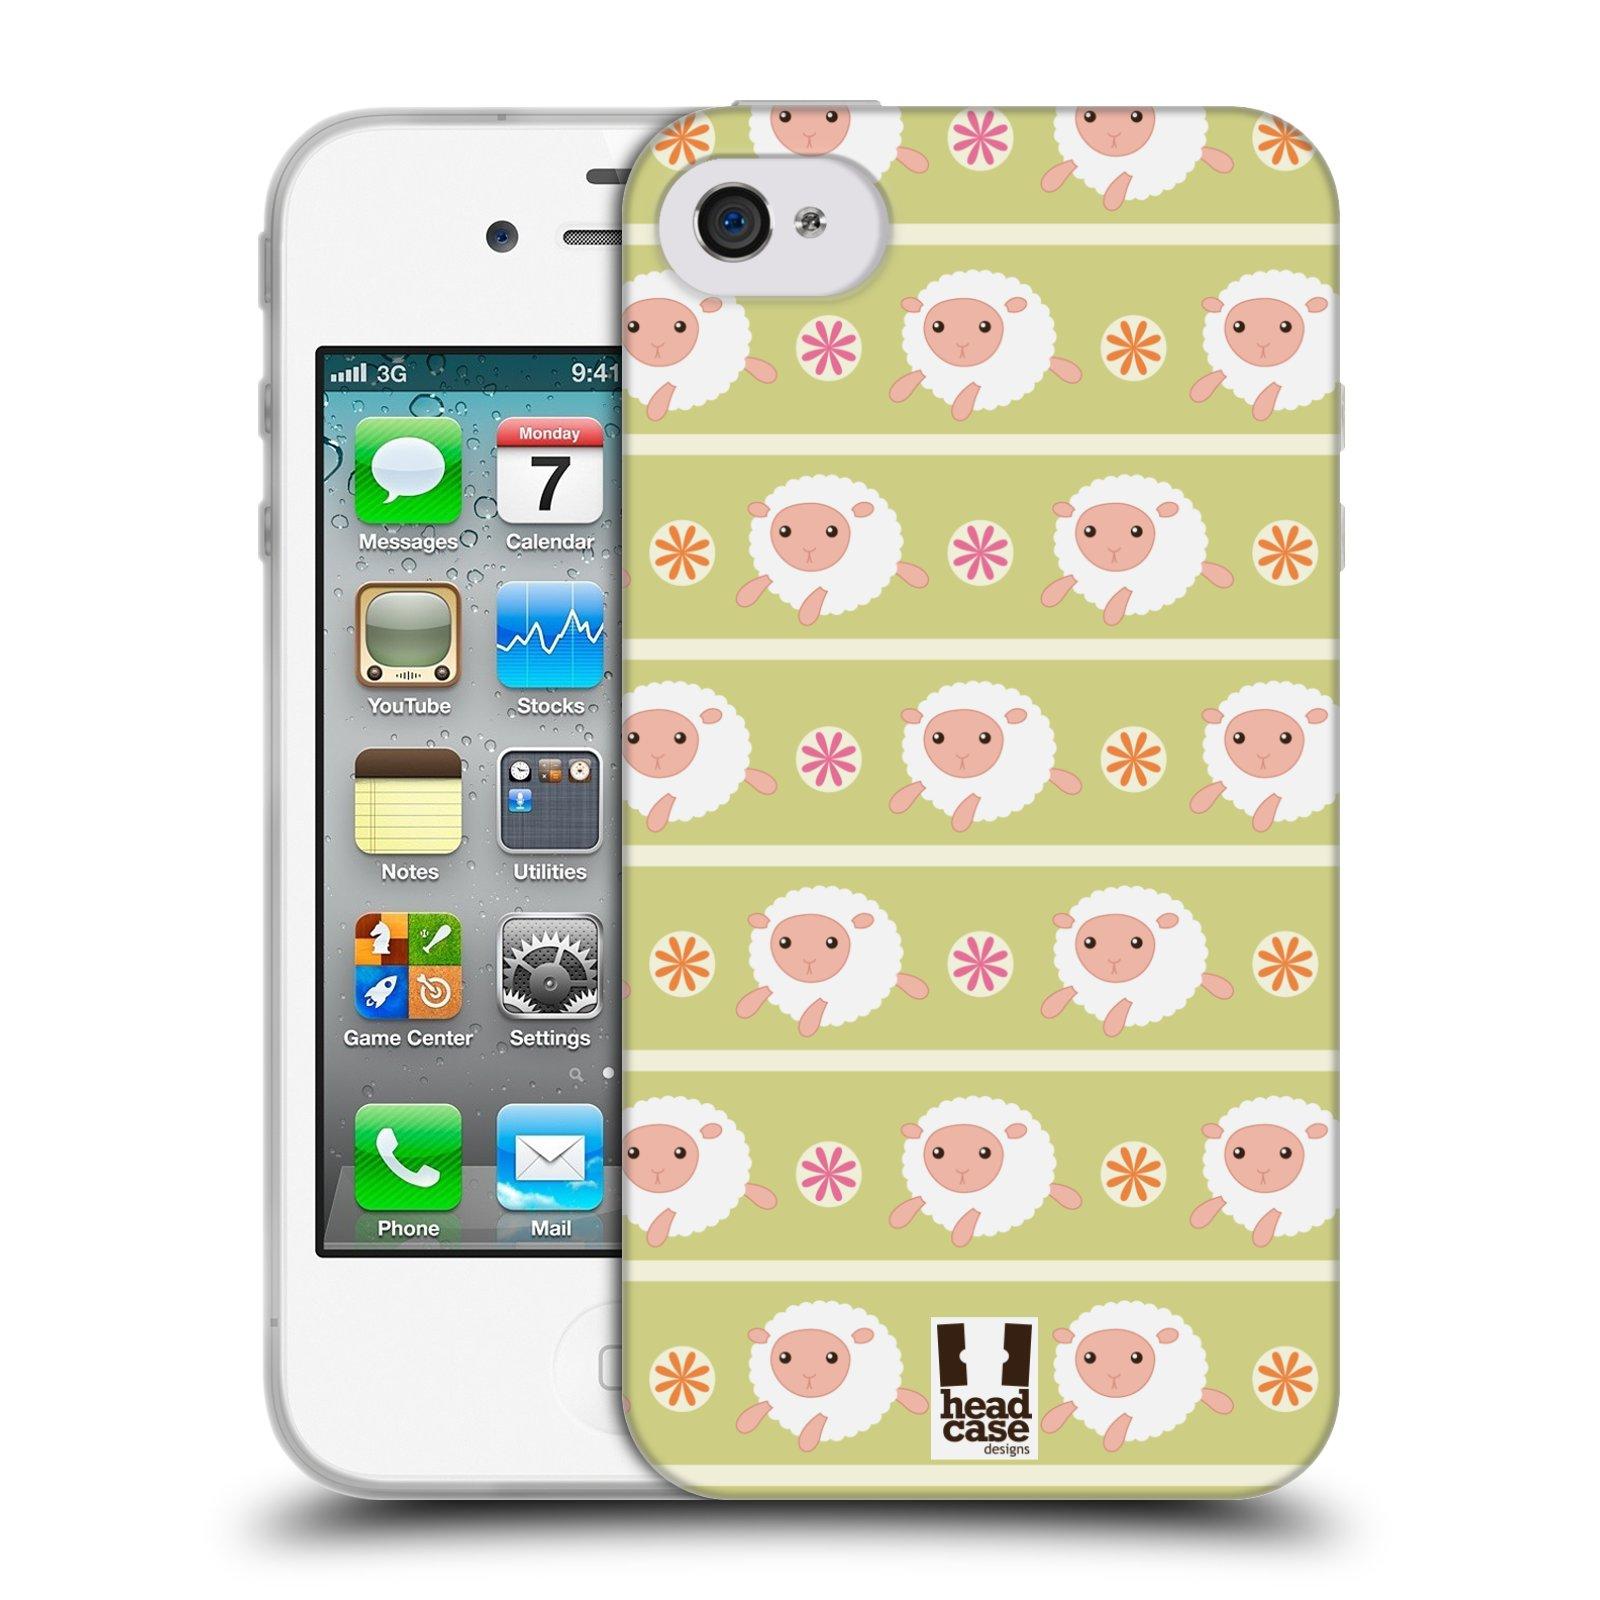 HEAD CASE silikonový obal na mobil Apple Iphone 4/4S vzor roztomilé zvířecí vzory ovečky